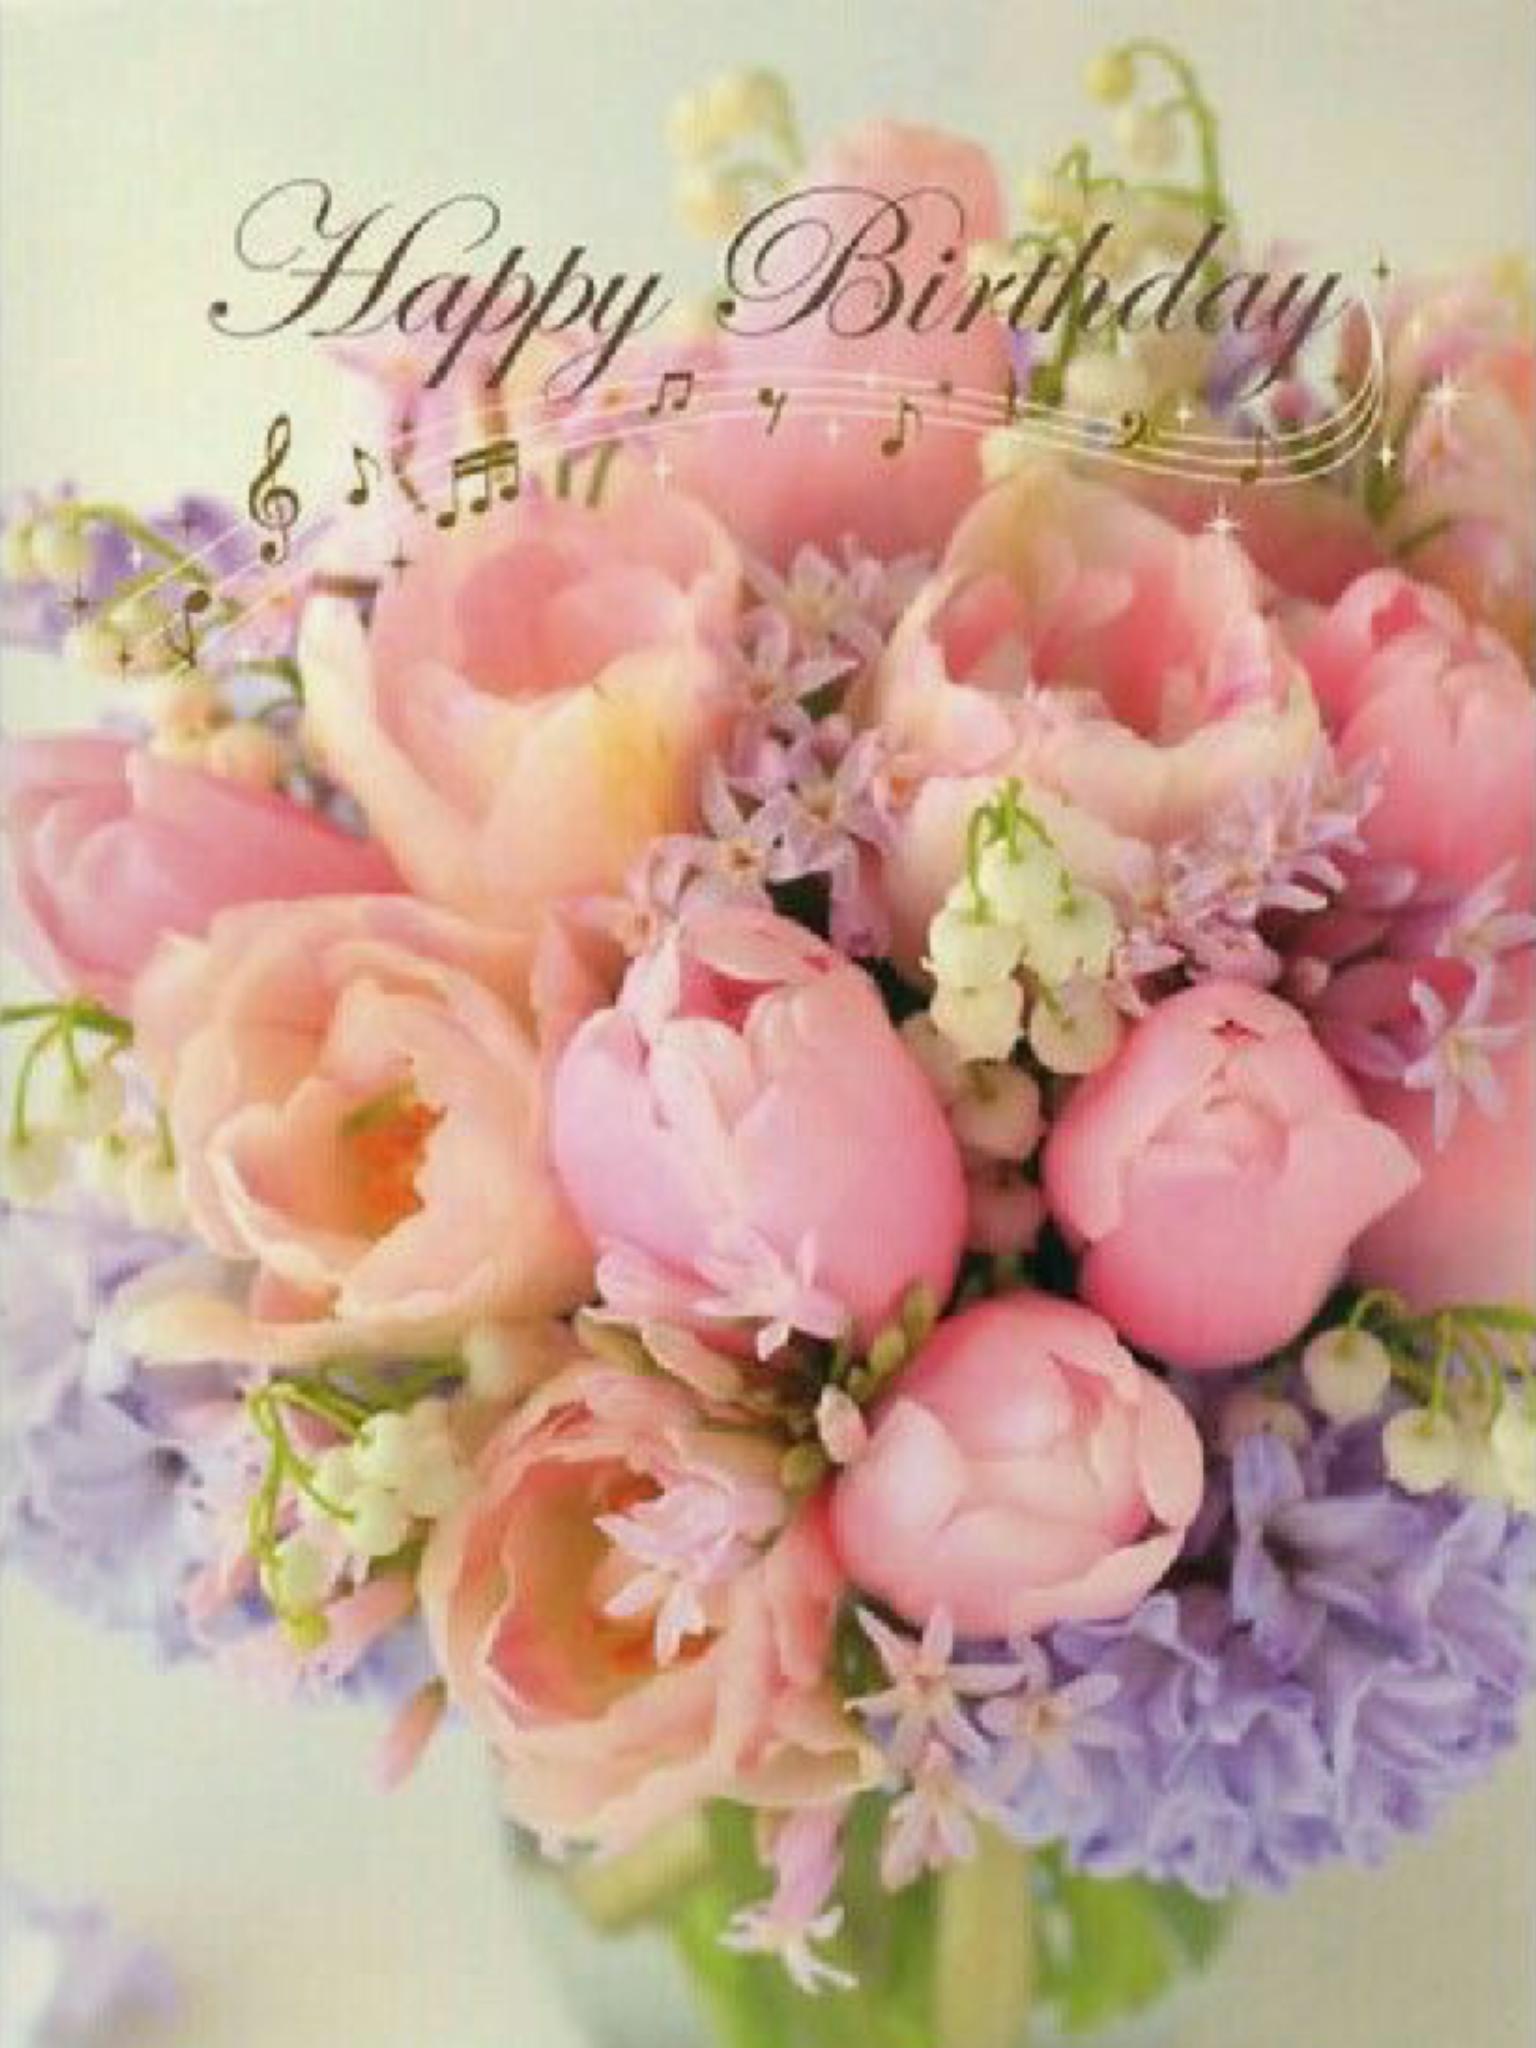 Birthday Wishes image by Carol Lucero Happy birthday